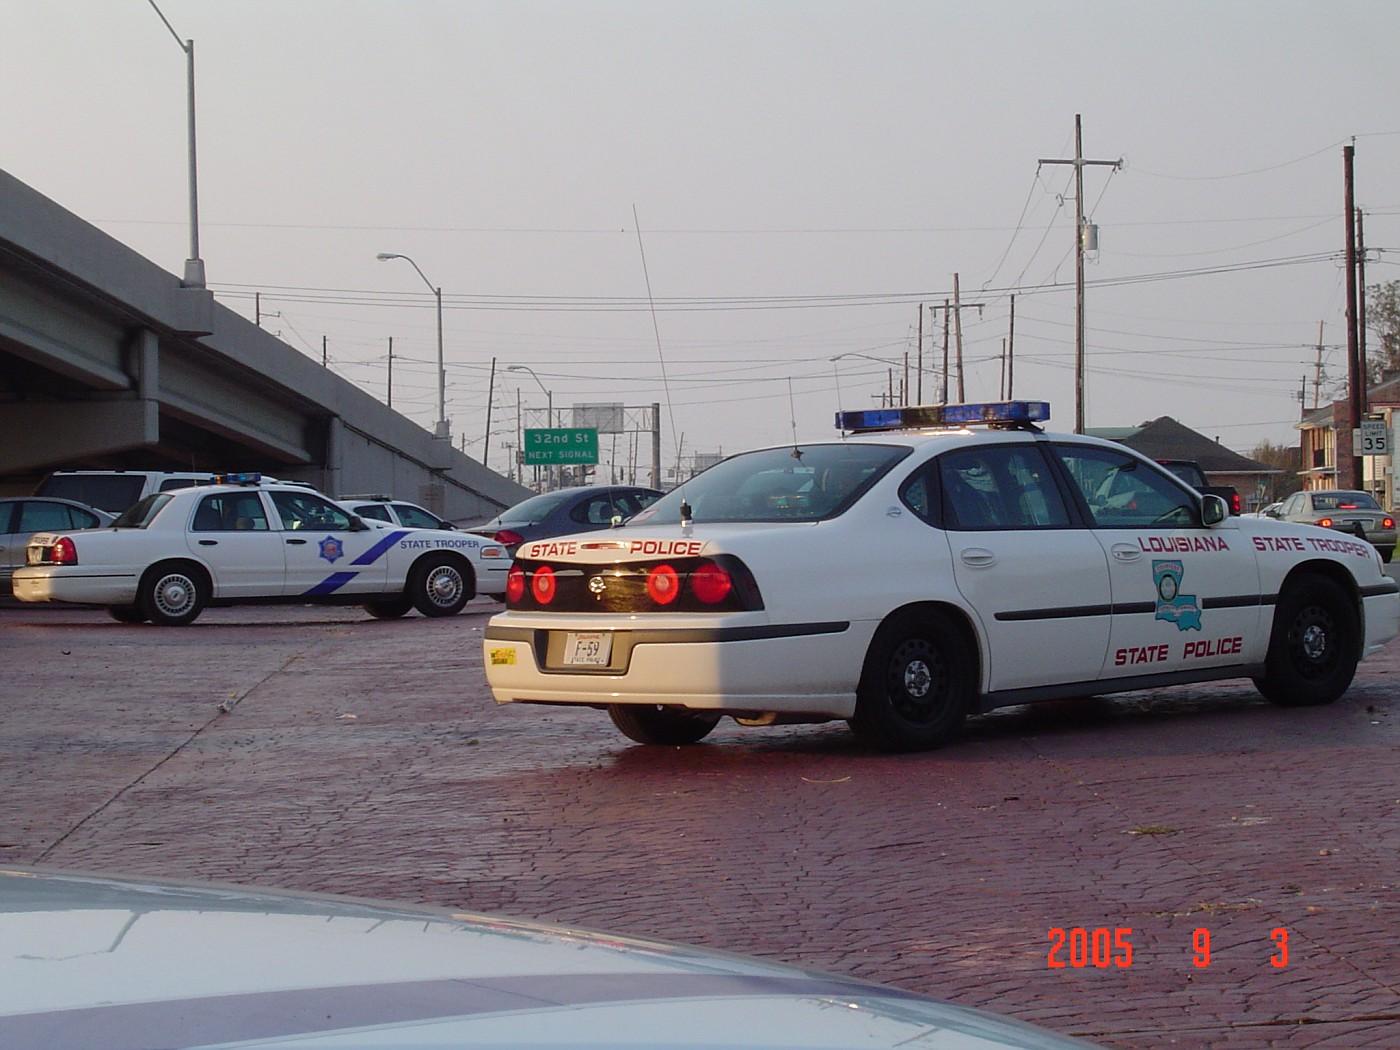 LA State Police